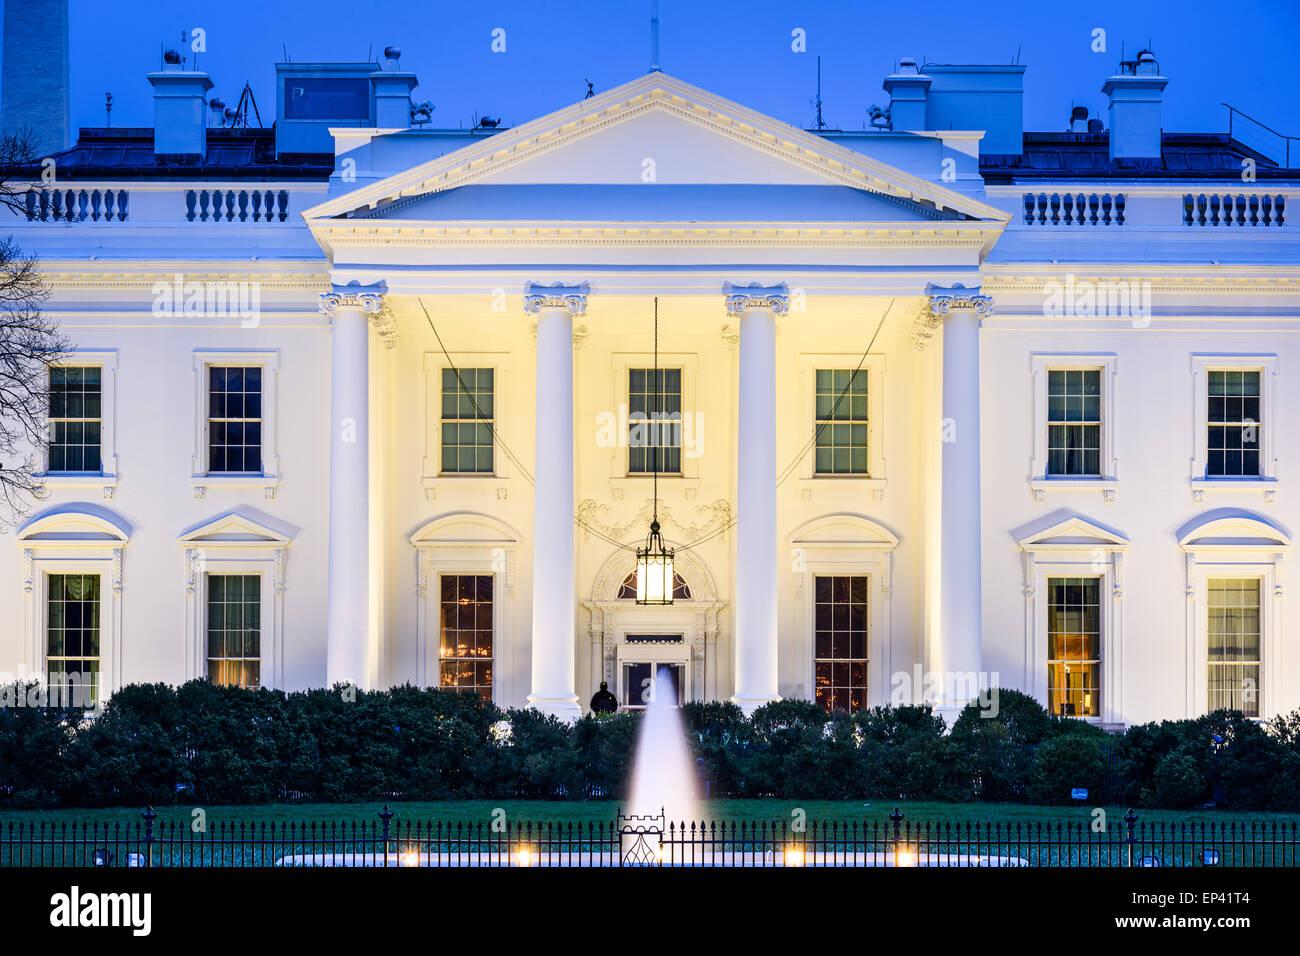 Washington, DC alla Casa Bianca. Immagini Stock